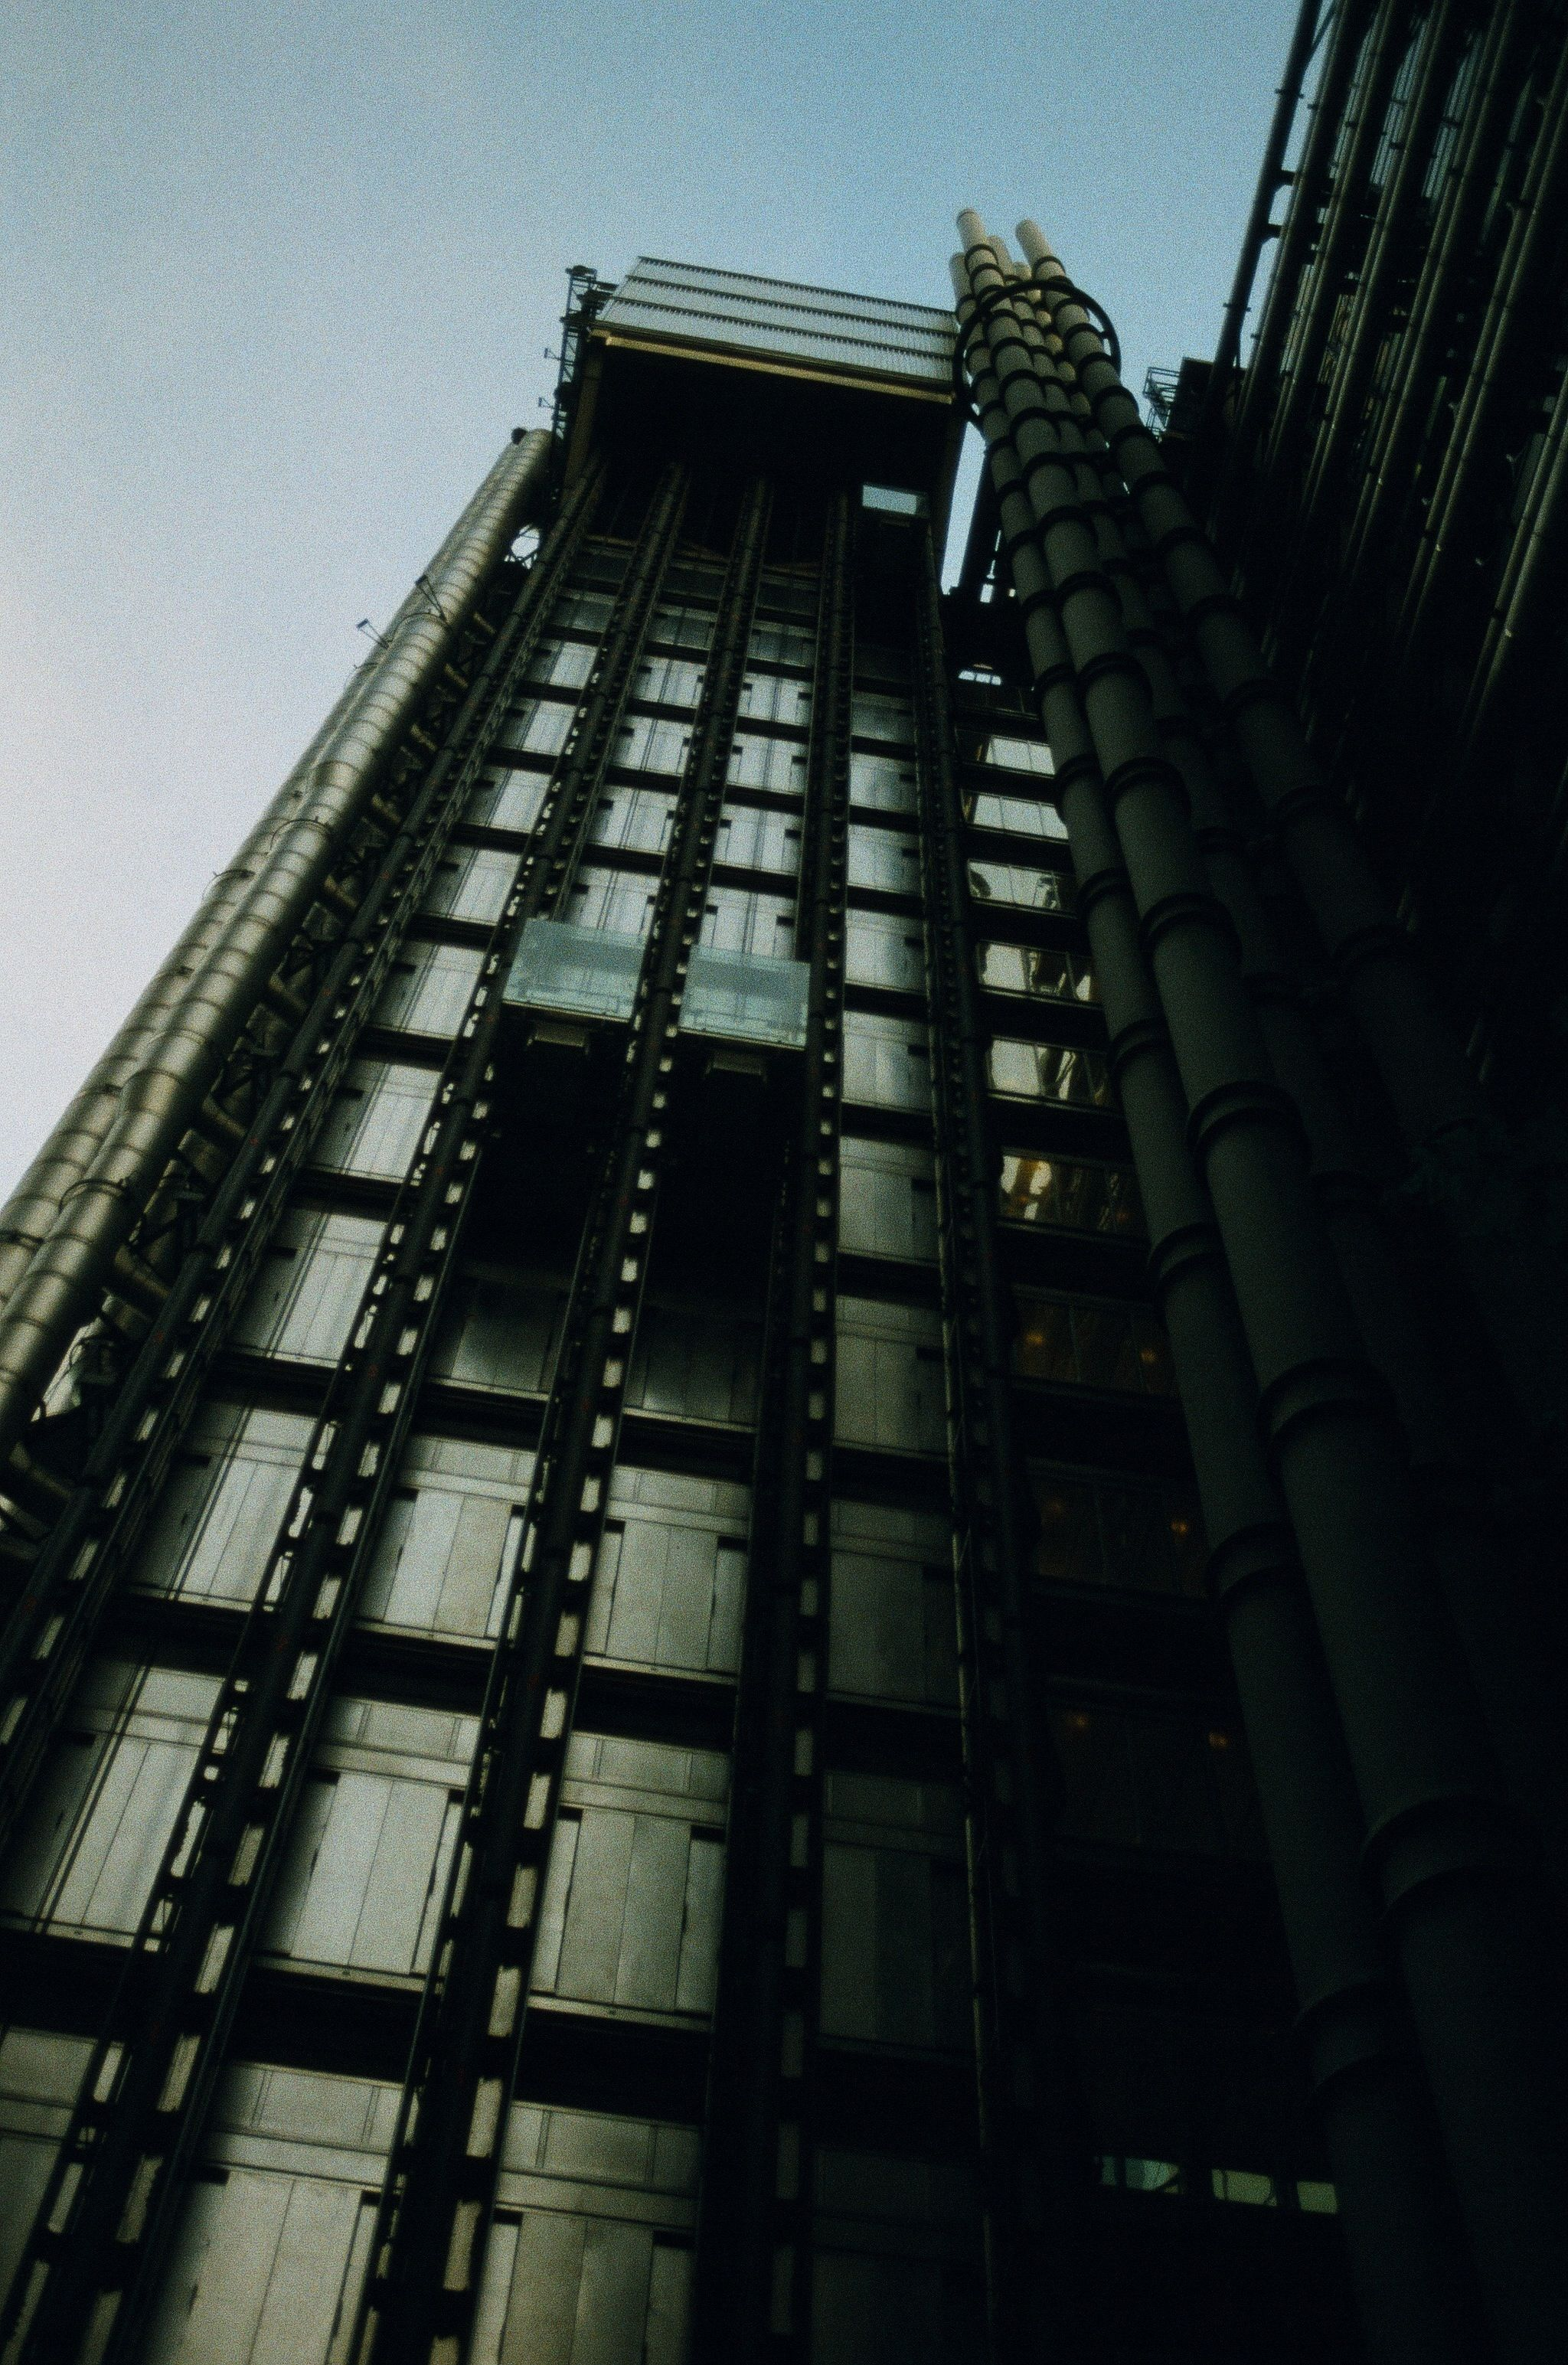 London, United Kingdom. 35mm Film Photography